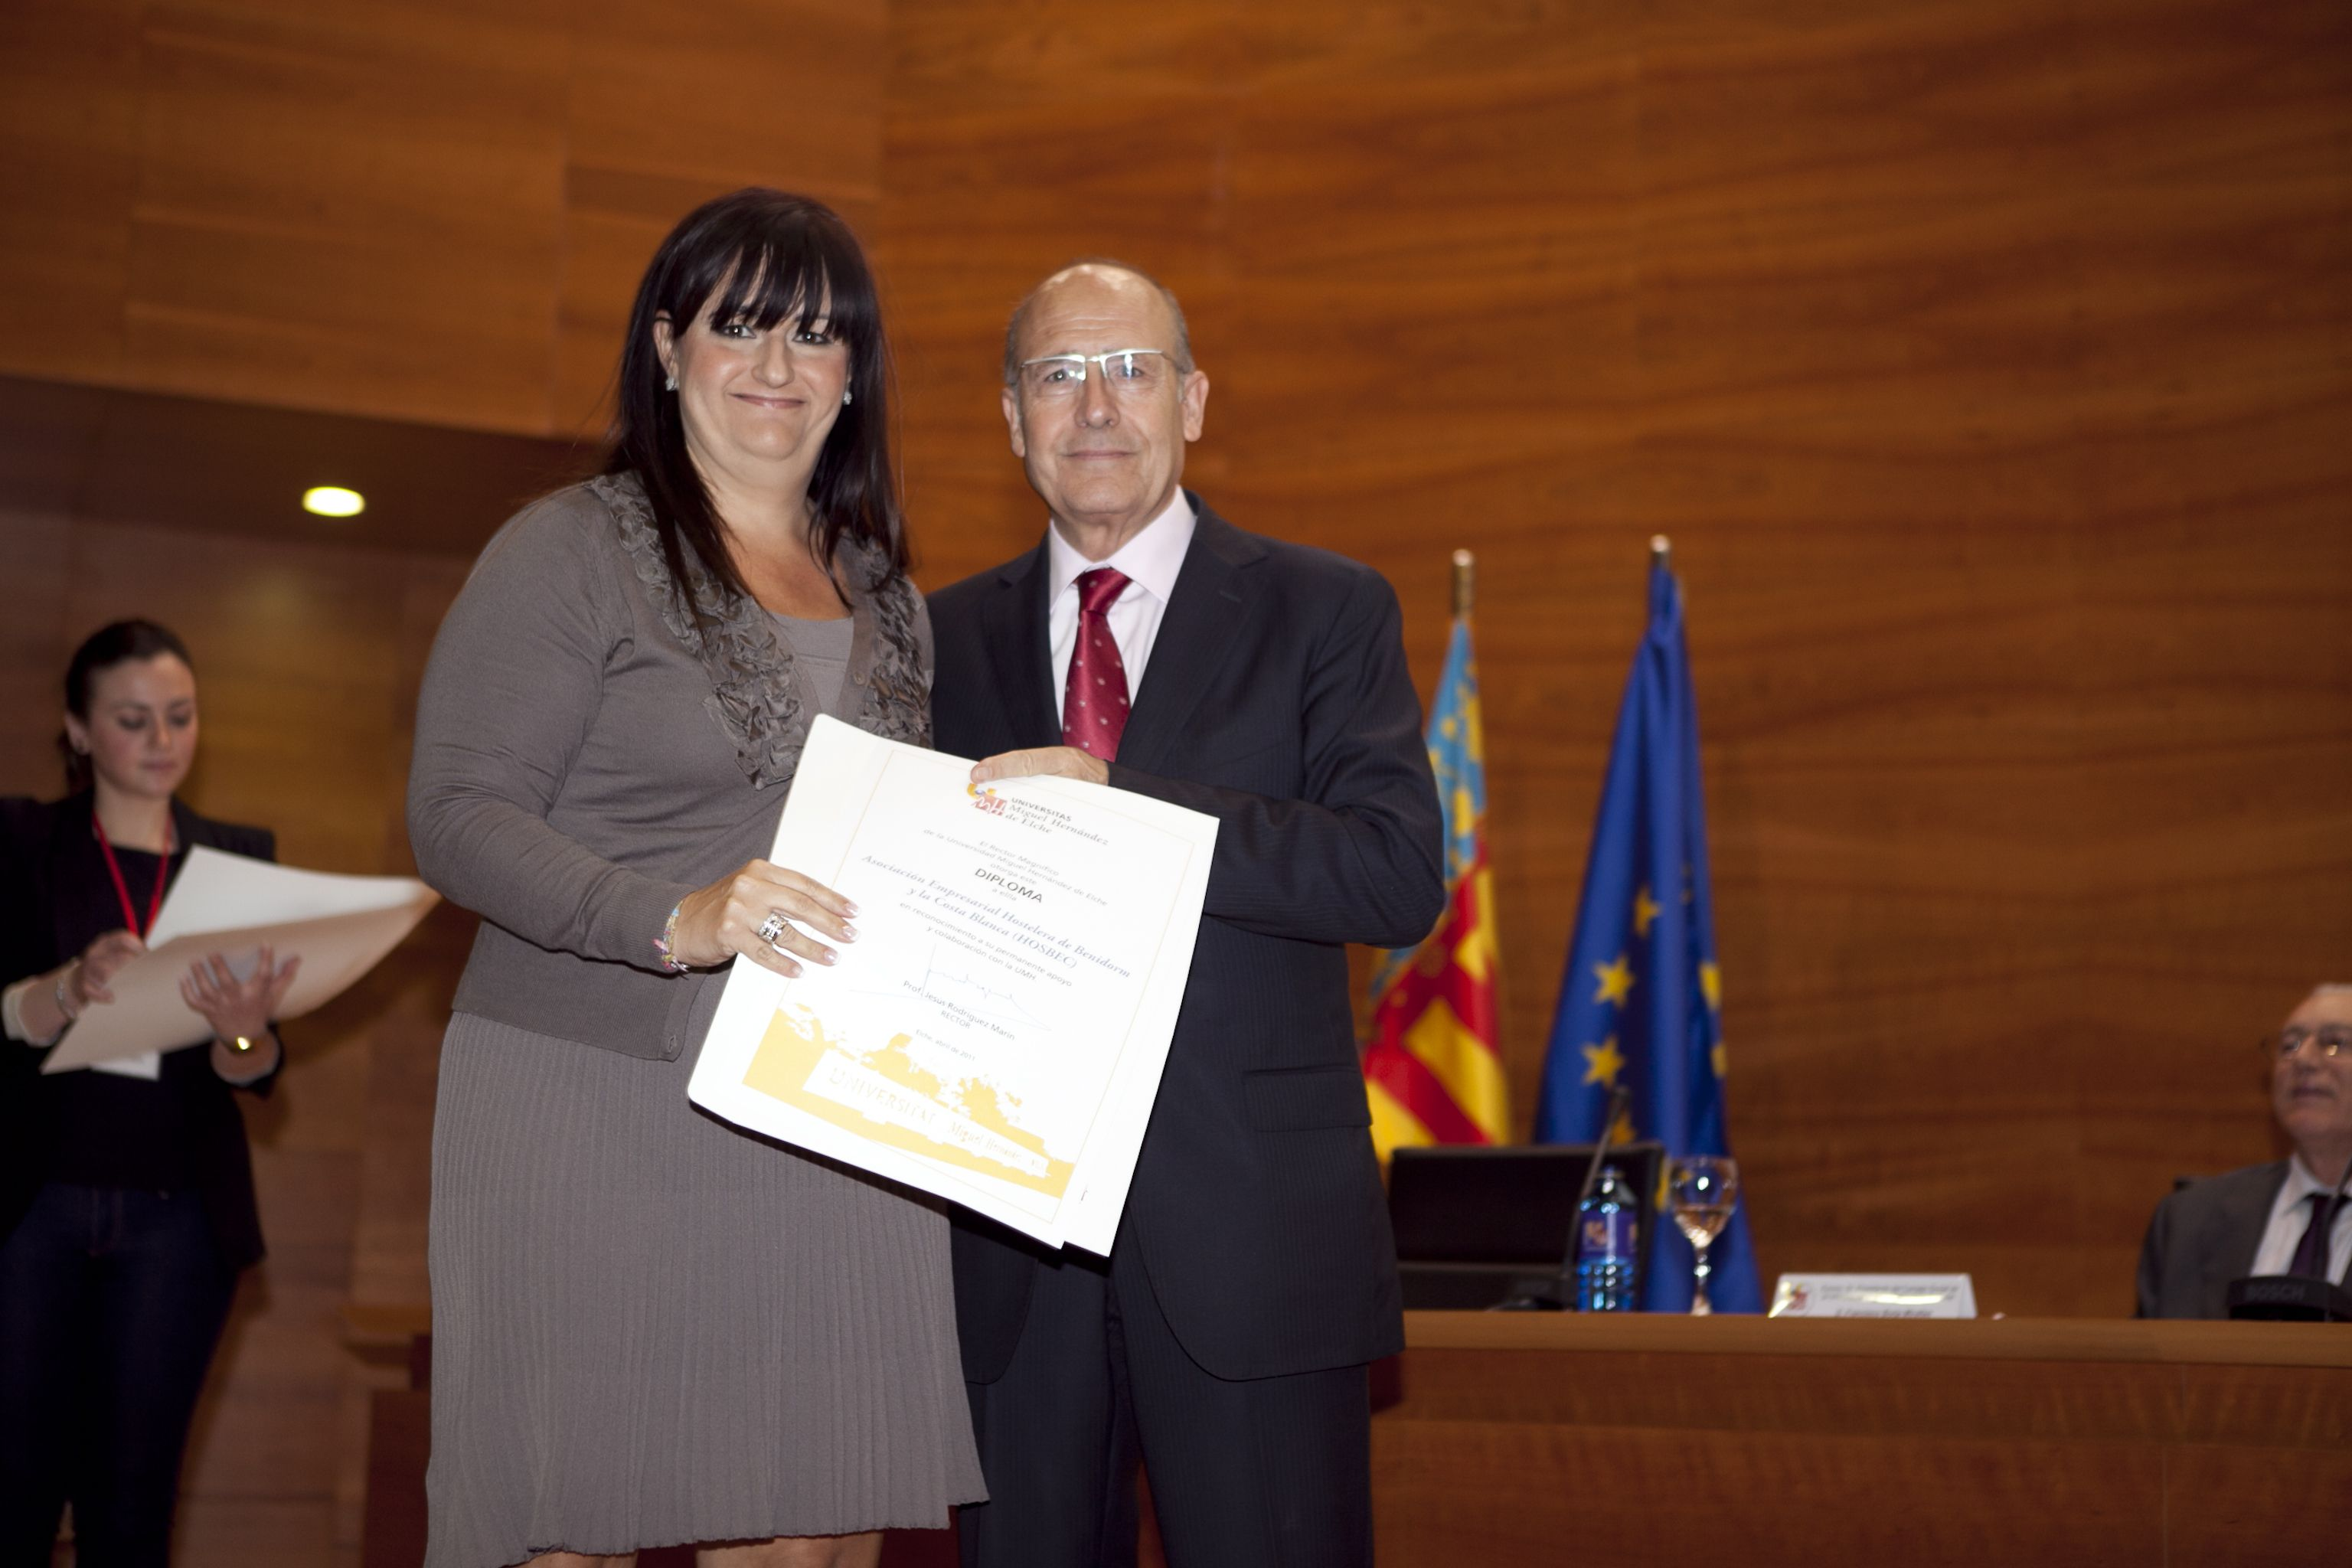 umh-diplomas-rector_mg_6577.jpg